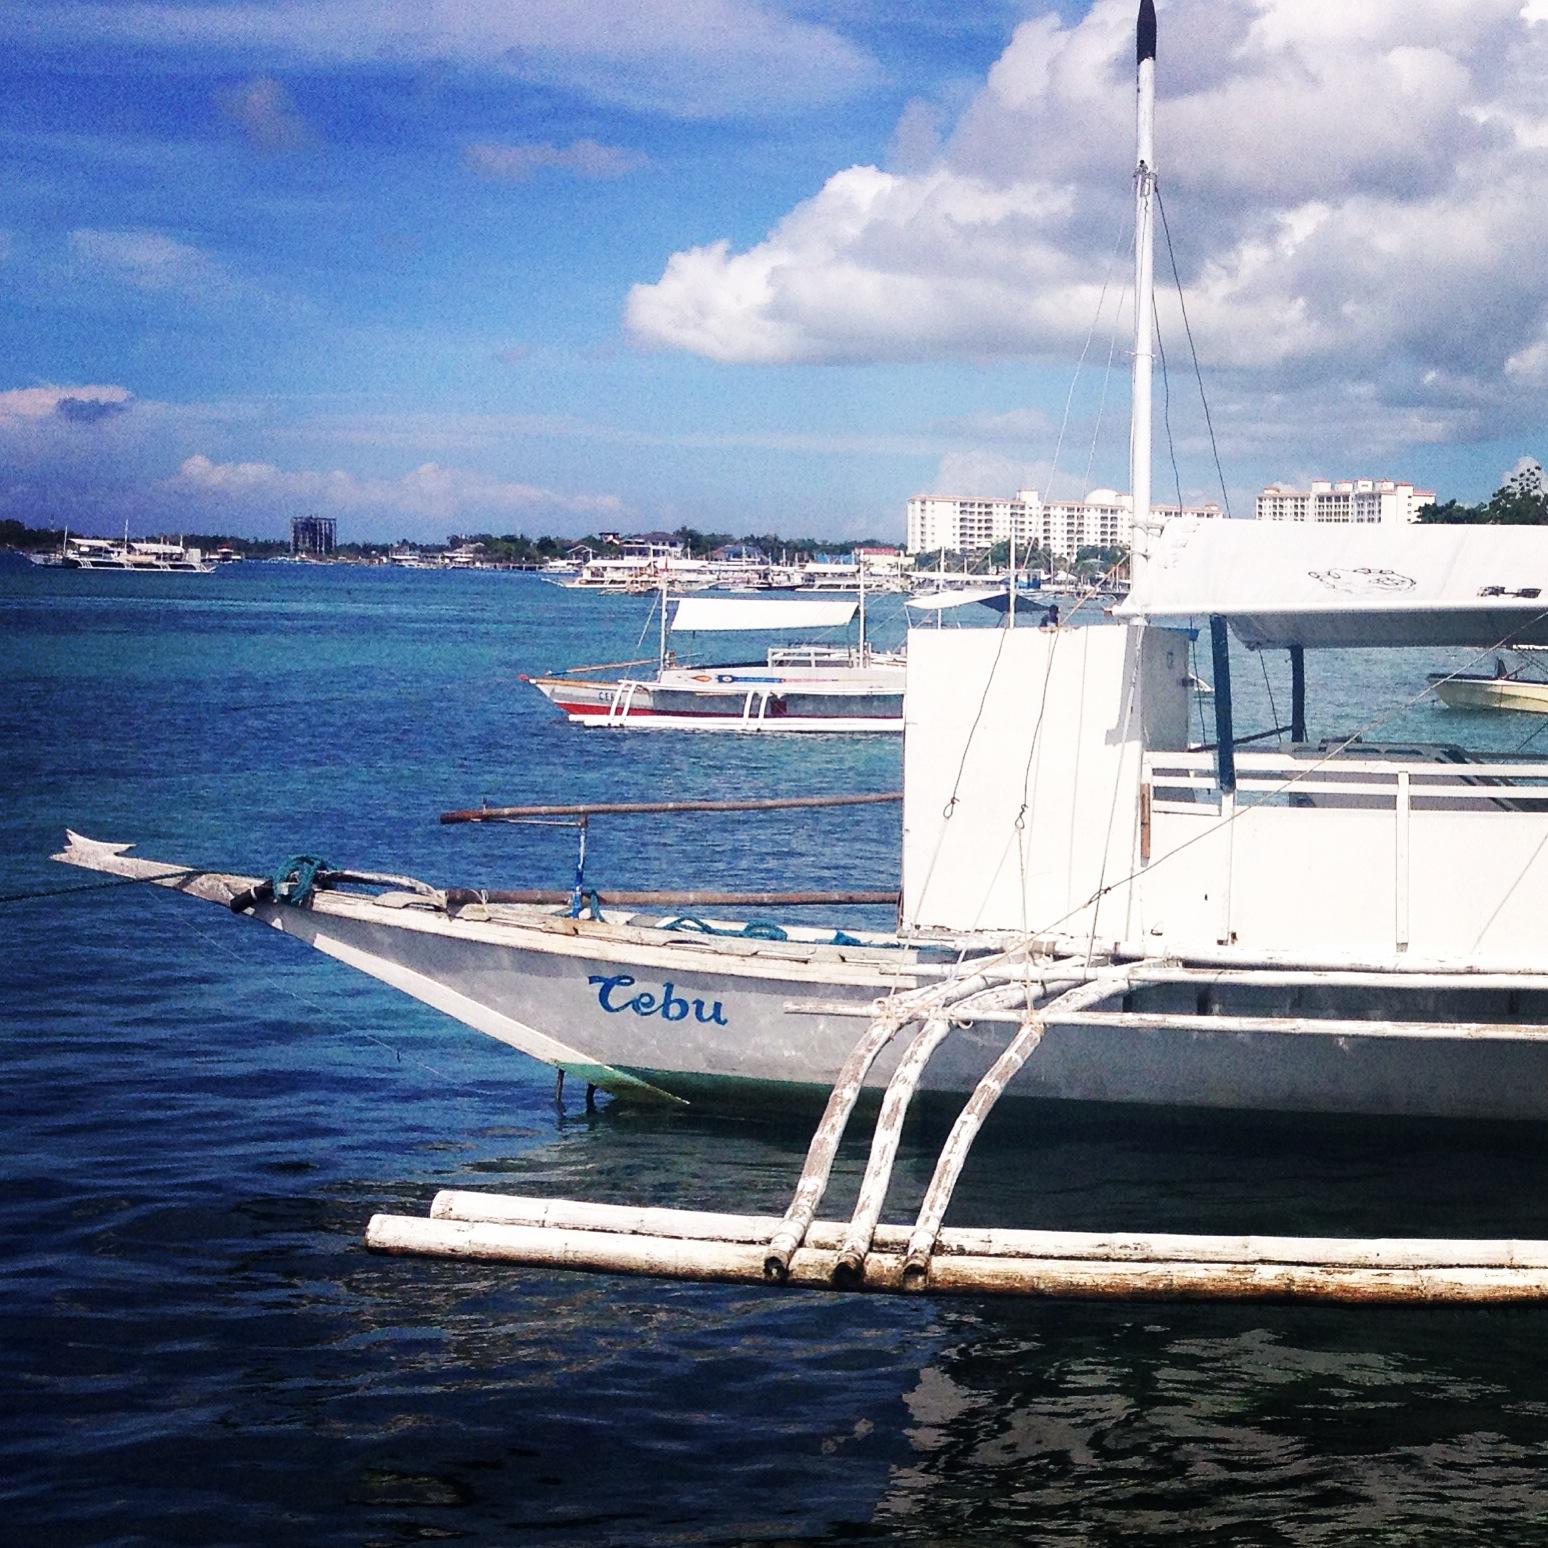 Cebu, Filippine @oltreilbalcone